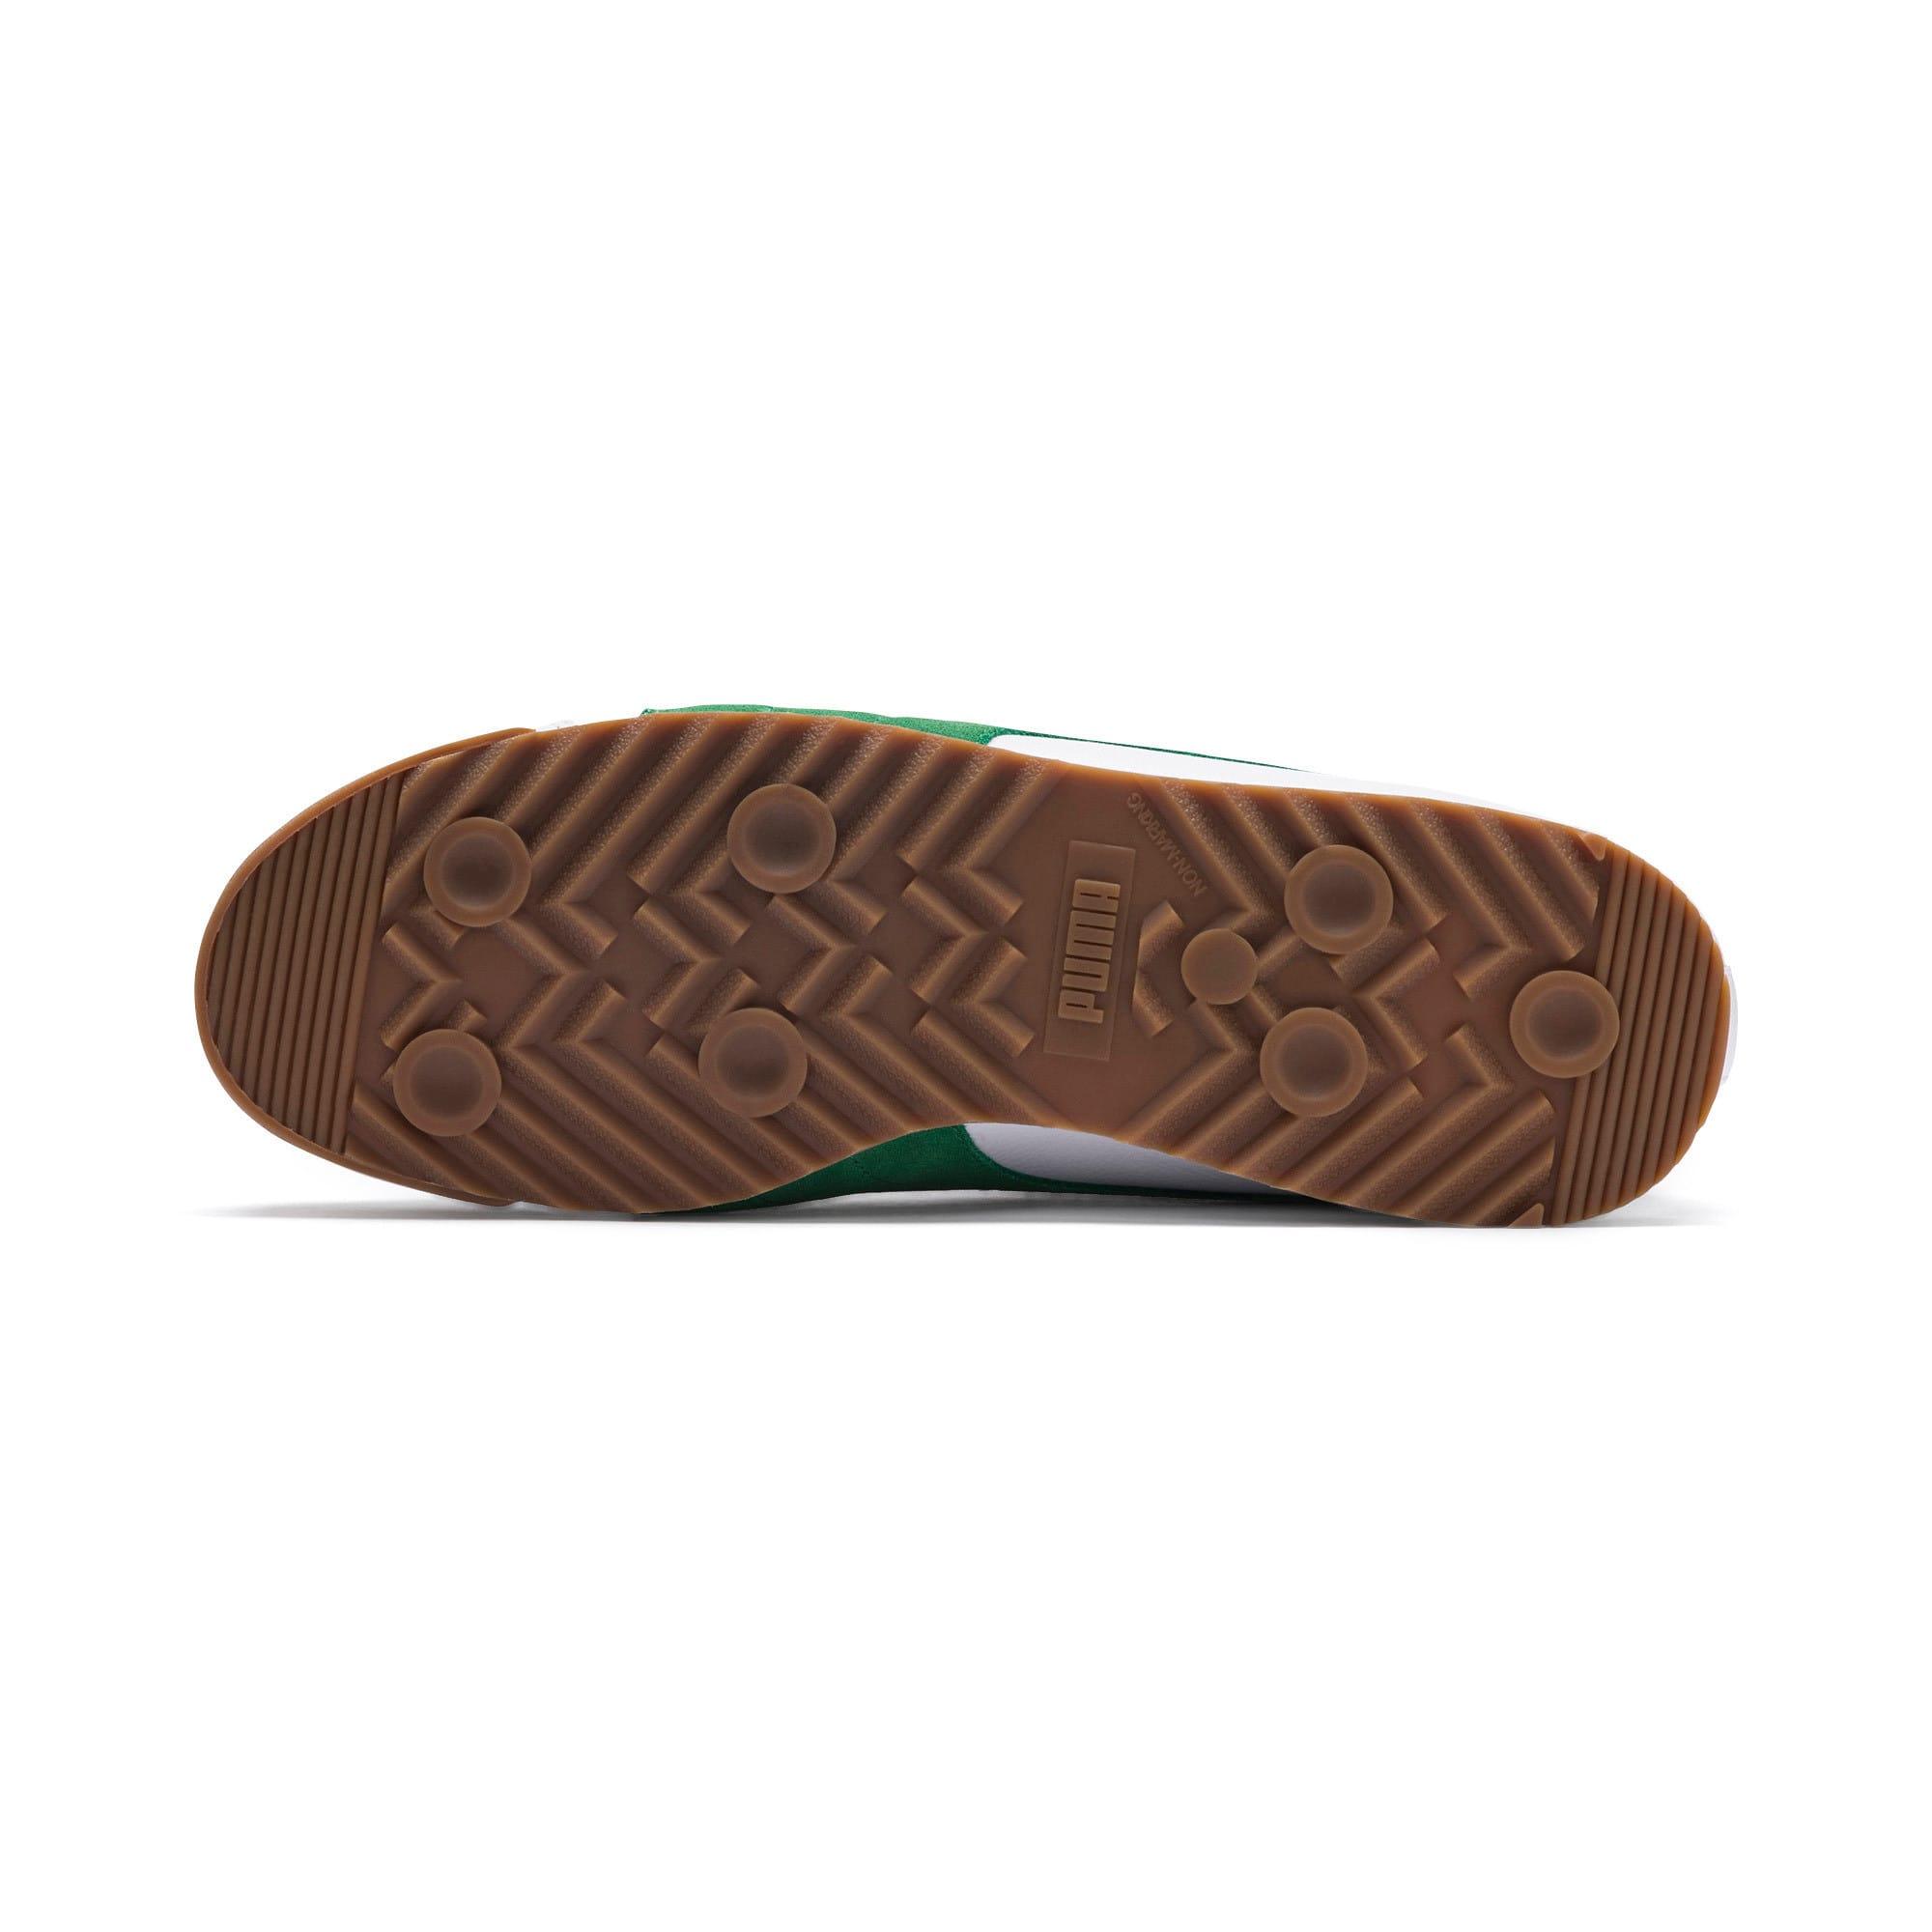 Thumbnail 5 of Roma '68 OG Sneakers, Puma White-Amazon Green, medium